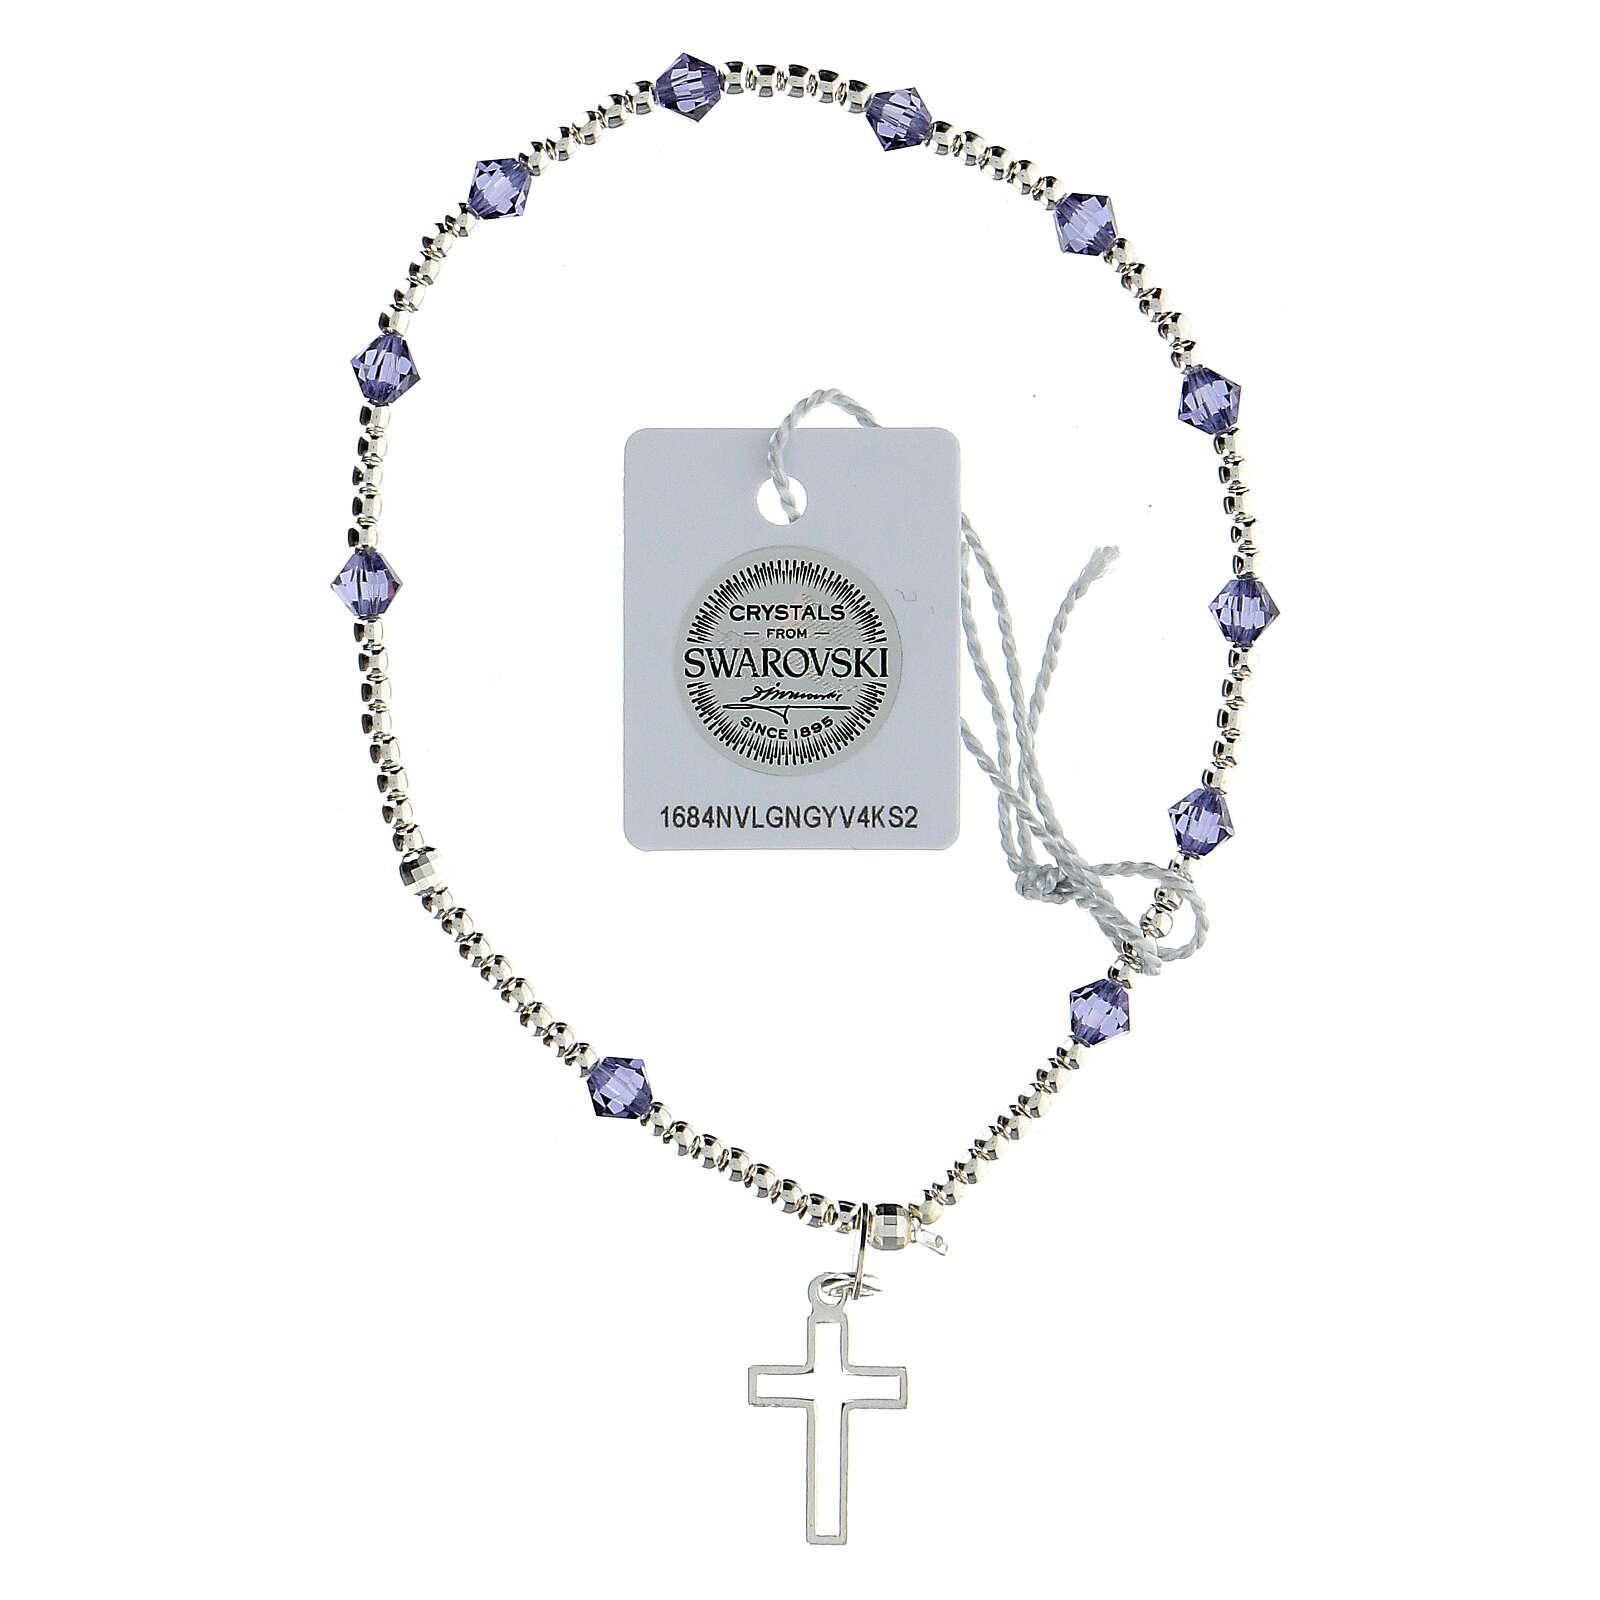 Pulsera cristales Swarovski violeta 4 mm cruz perforada plata 925 4